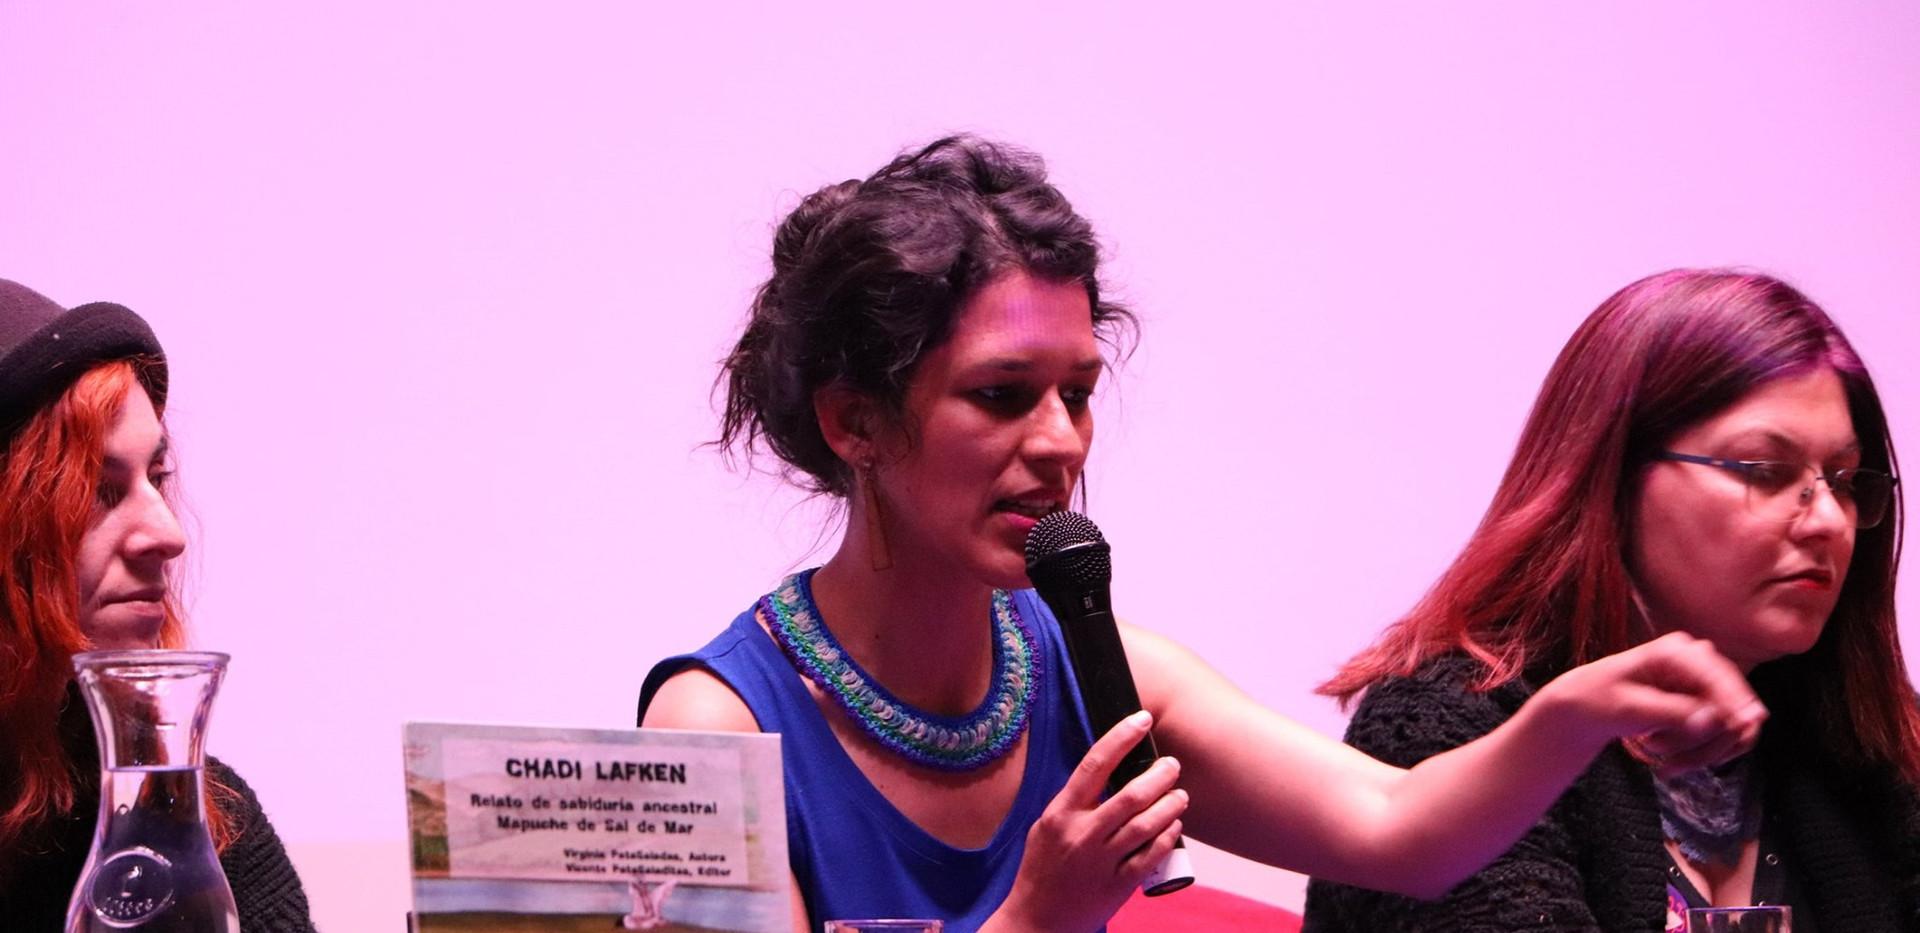 Virginia PataSaladas, autora de Chadi Lafken